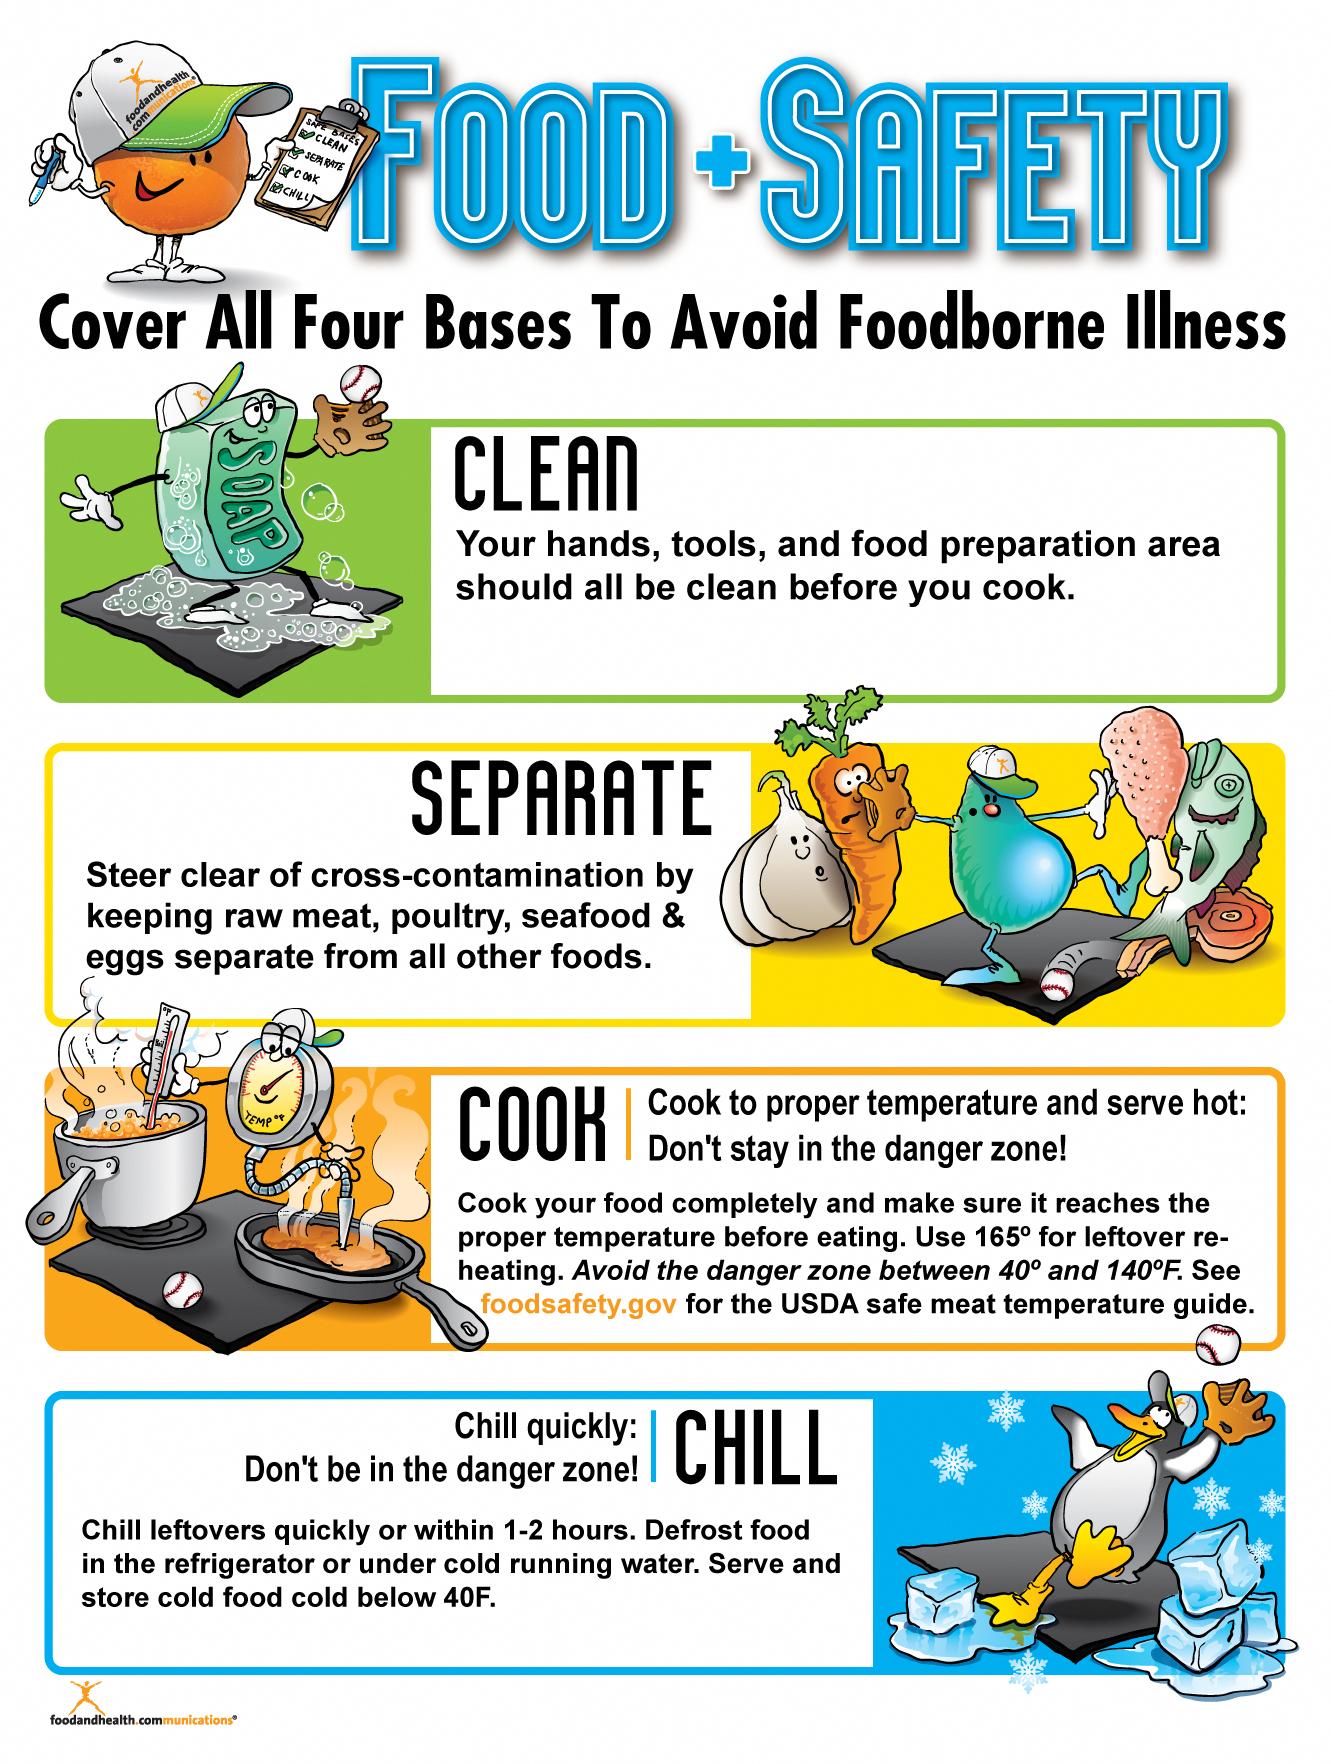 Food Safety Poster In 2020 Food Safety Food Safety Sanitation